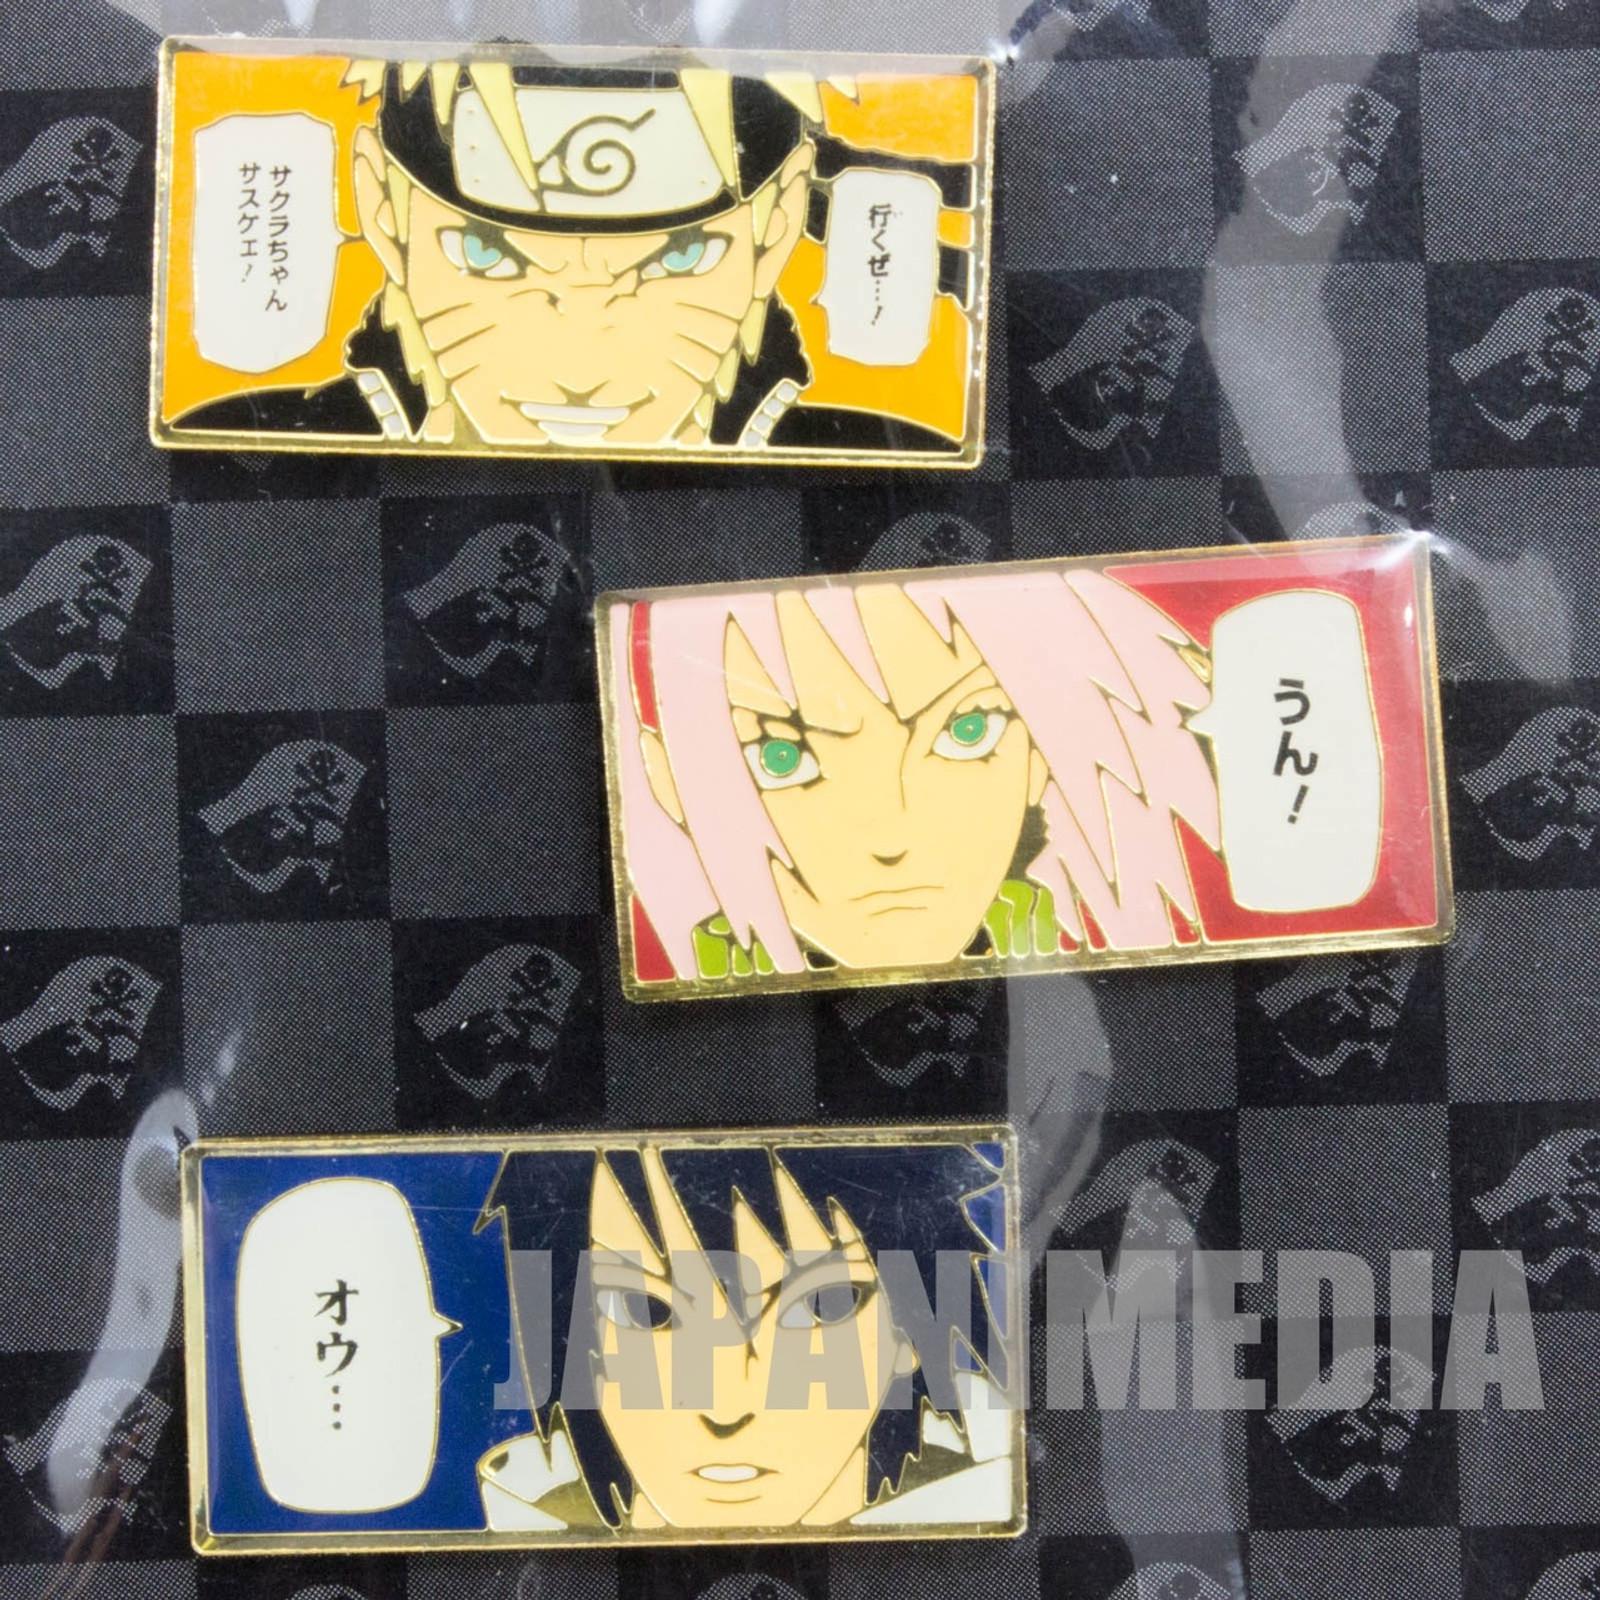 NARUTO Shippuden Character Pins Collection Sasuke Sakura JAPAN ANIME MANGA